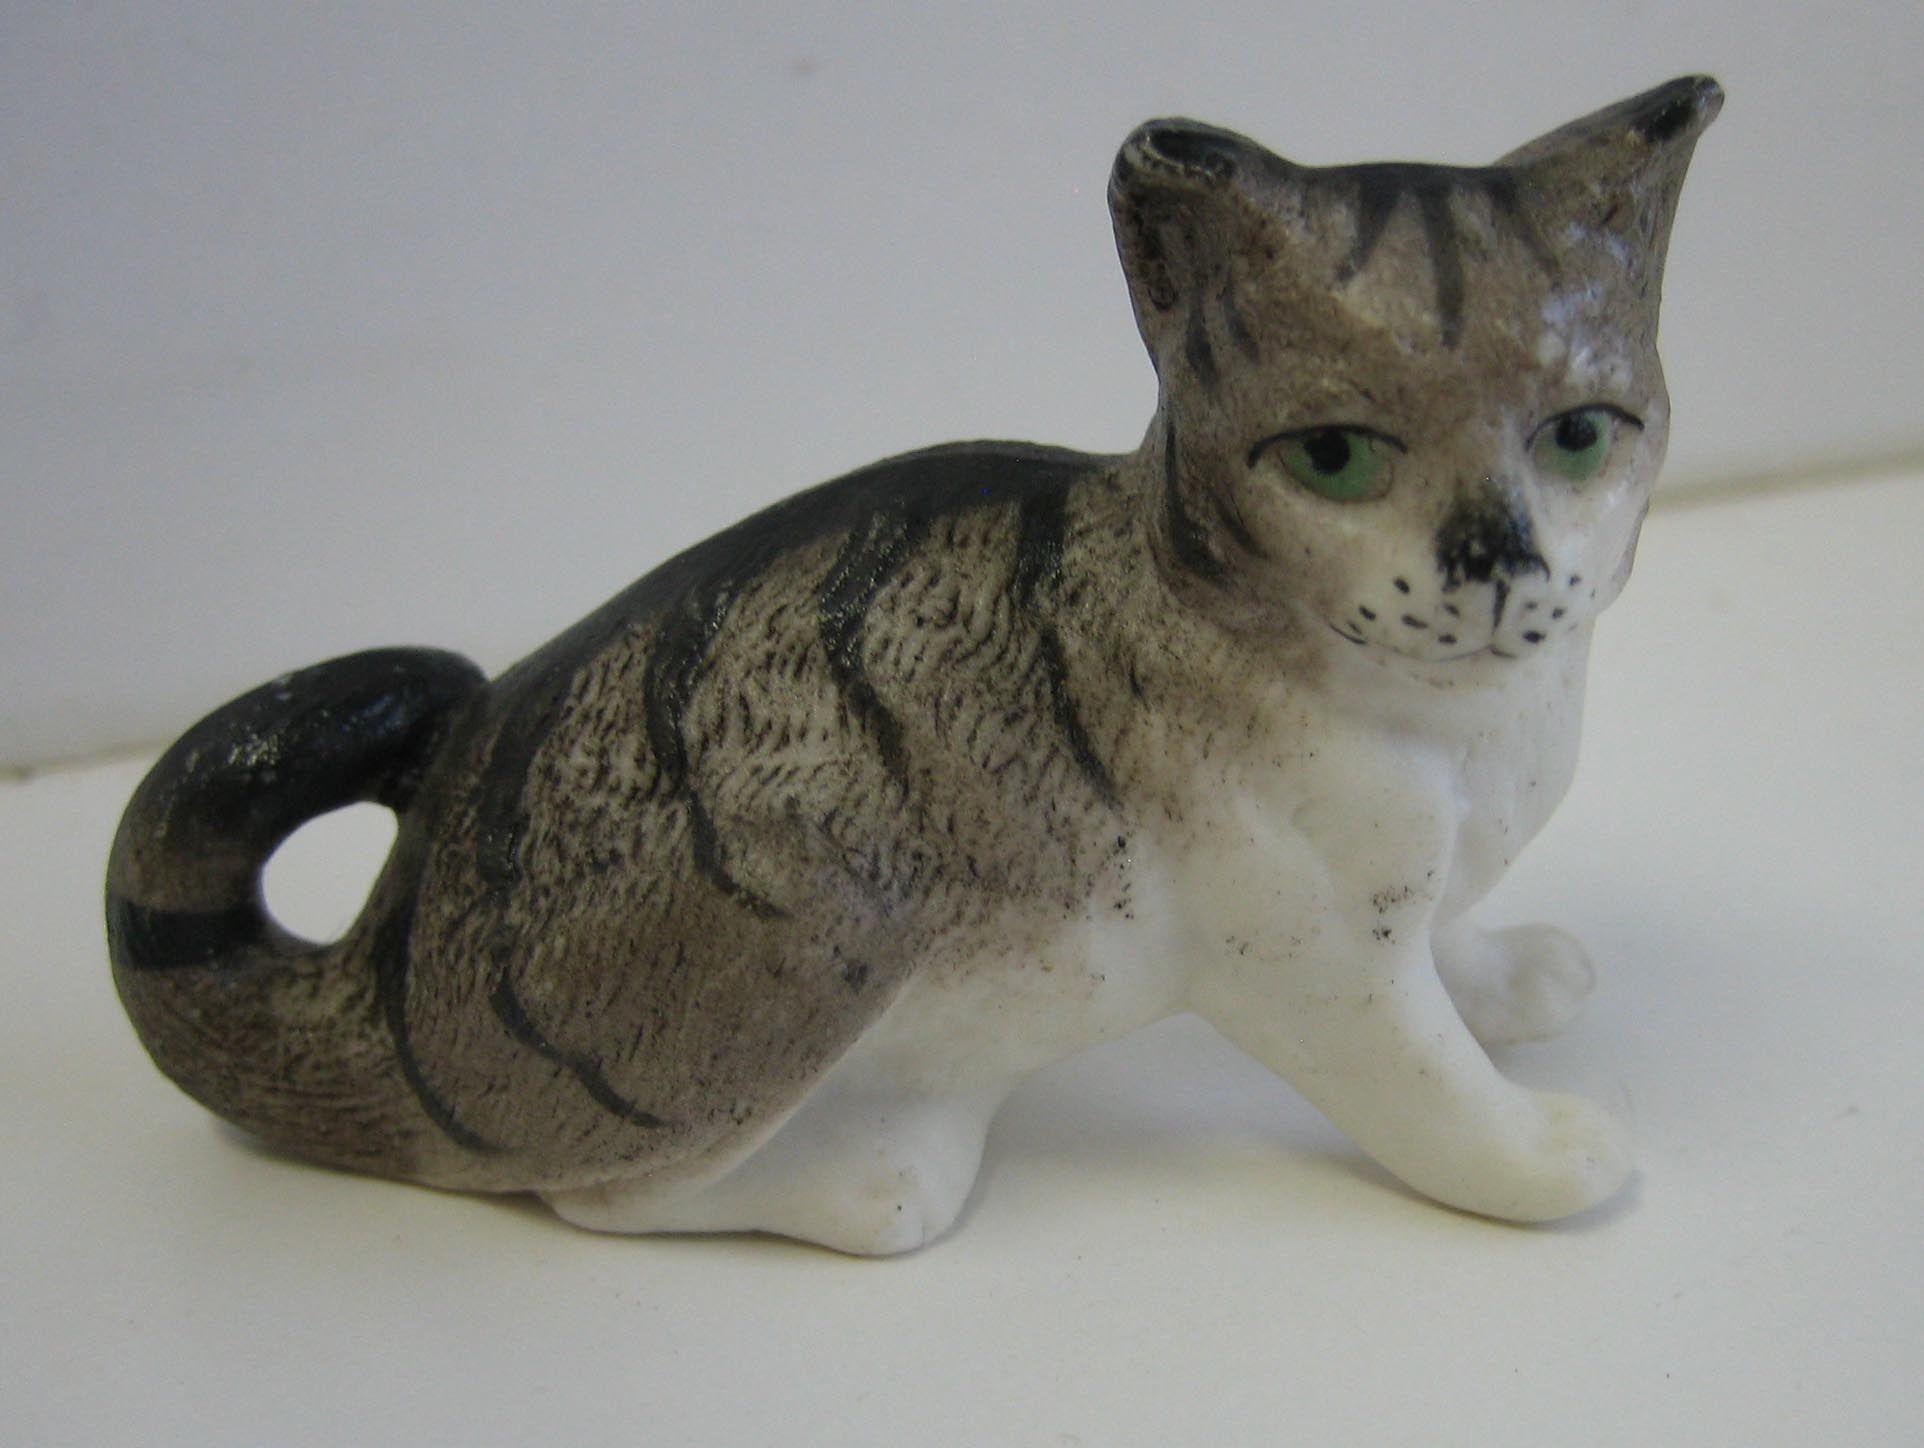 catgryporjpg 19241448 catgryporjpg 19241448 Antique Doll